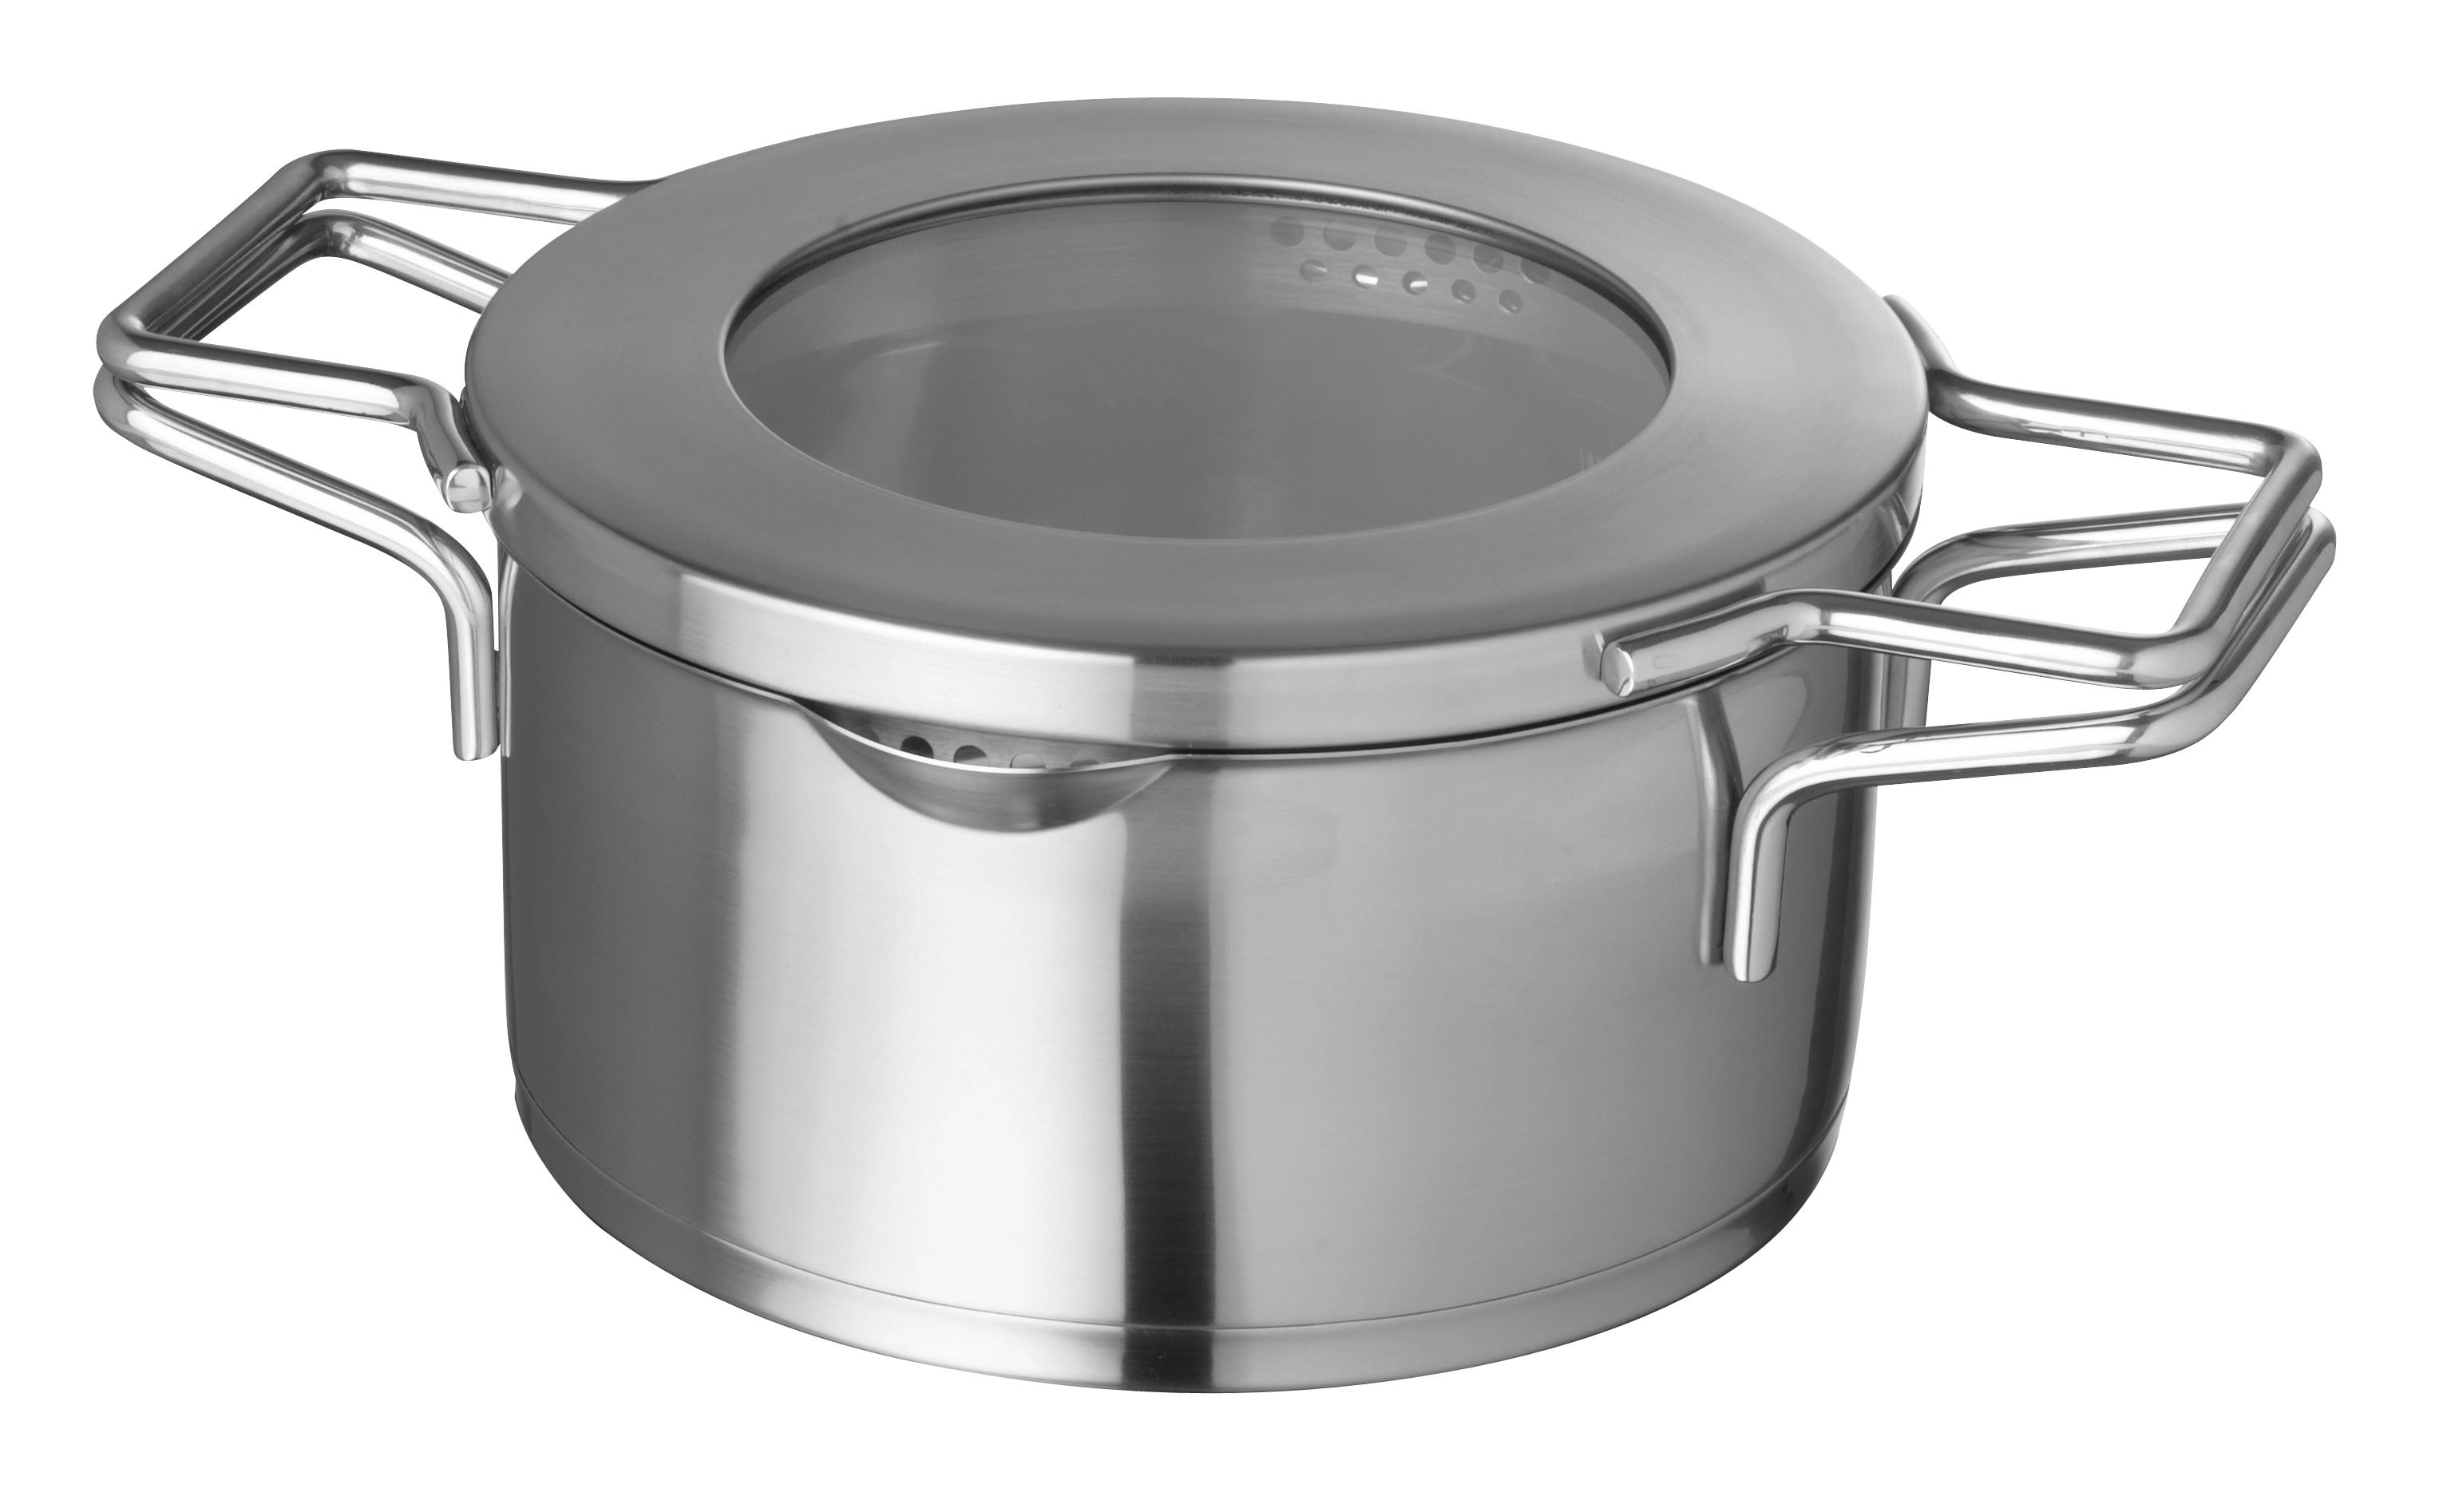 OBH Nordica Supreme Steel Gryta 3 liter